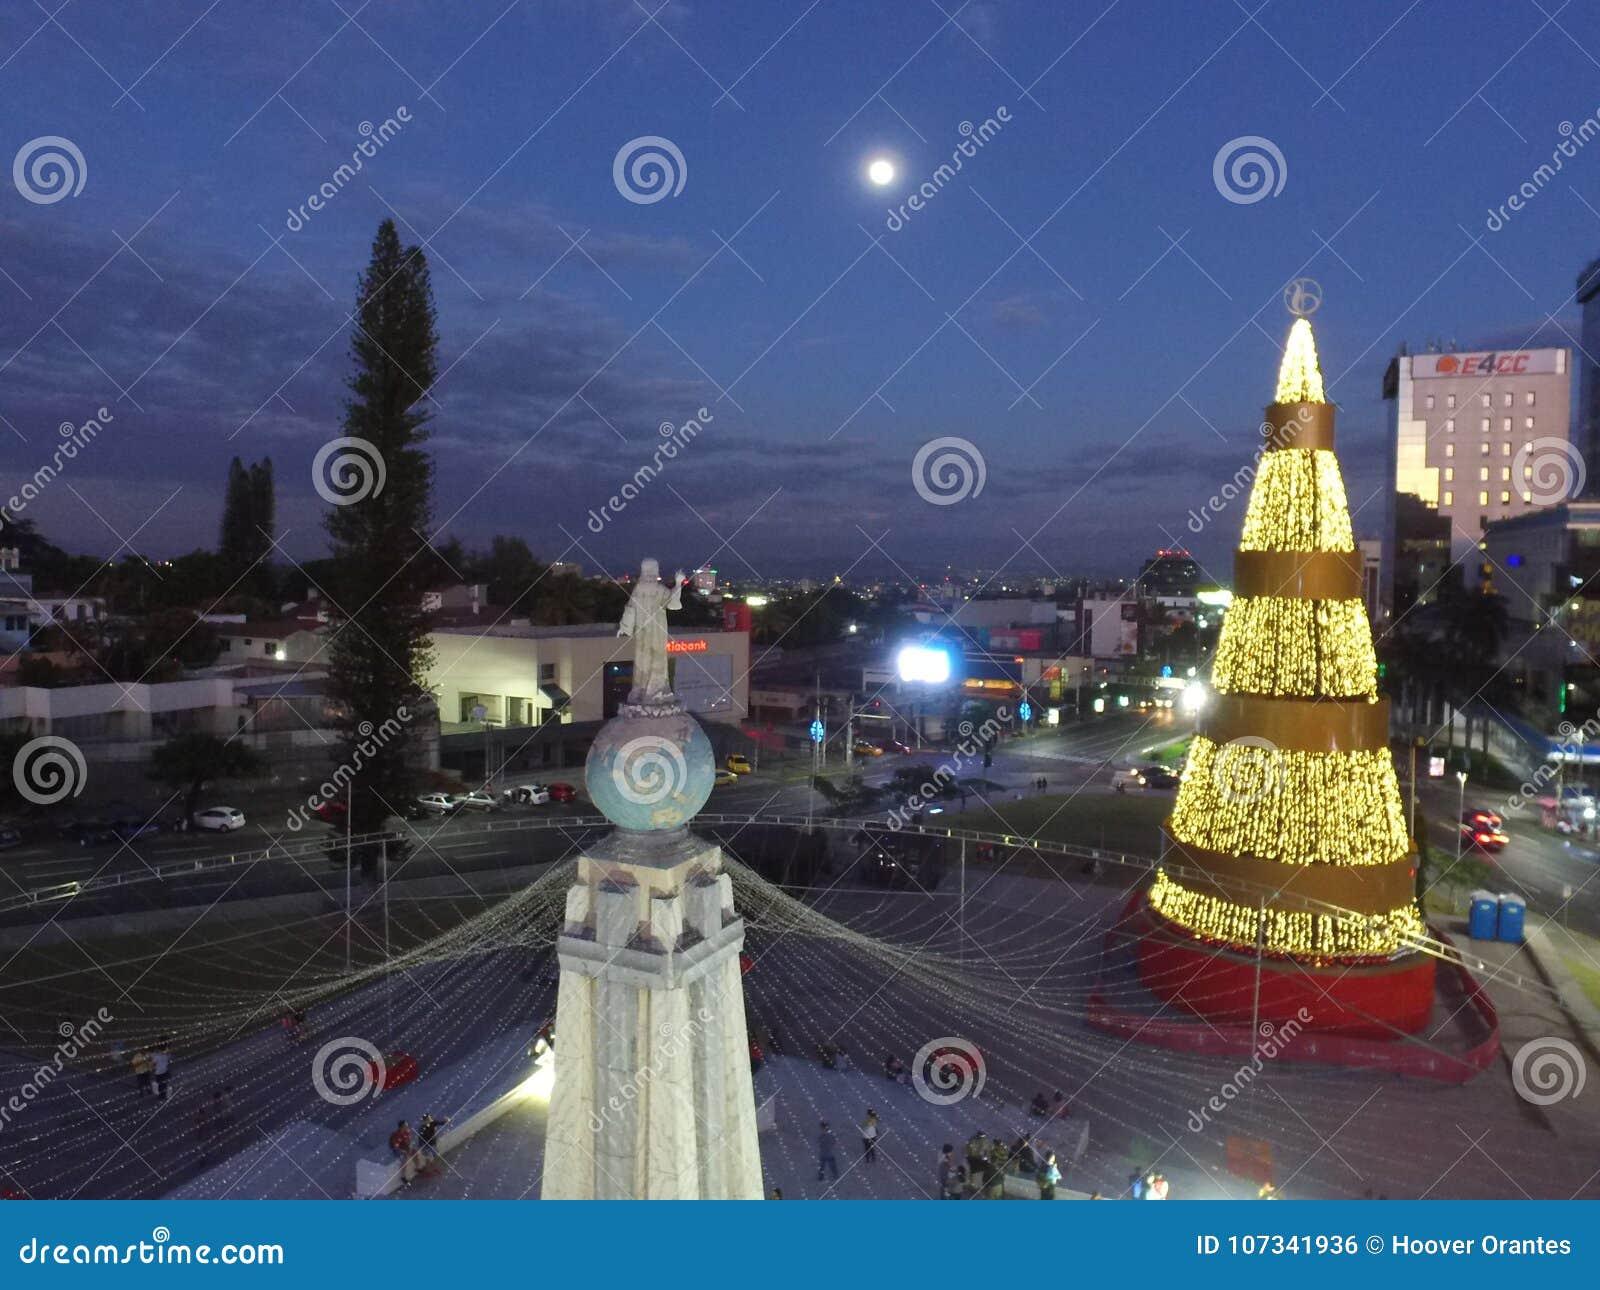 monumento al salvador del mundo stock photo image of evening